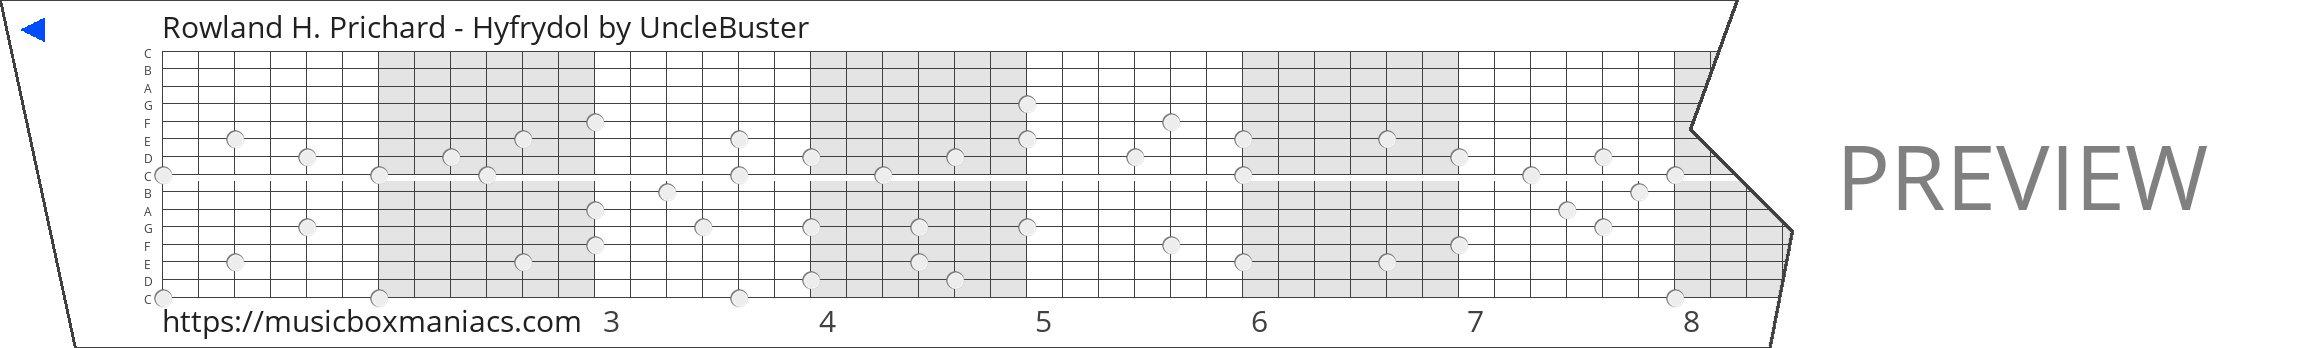 Rowland H. Prichard - Hyfrydol 15 note music box paper strip